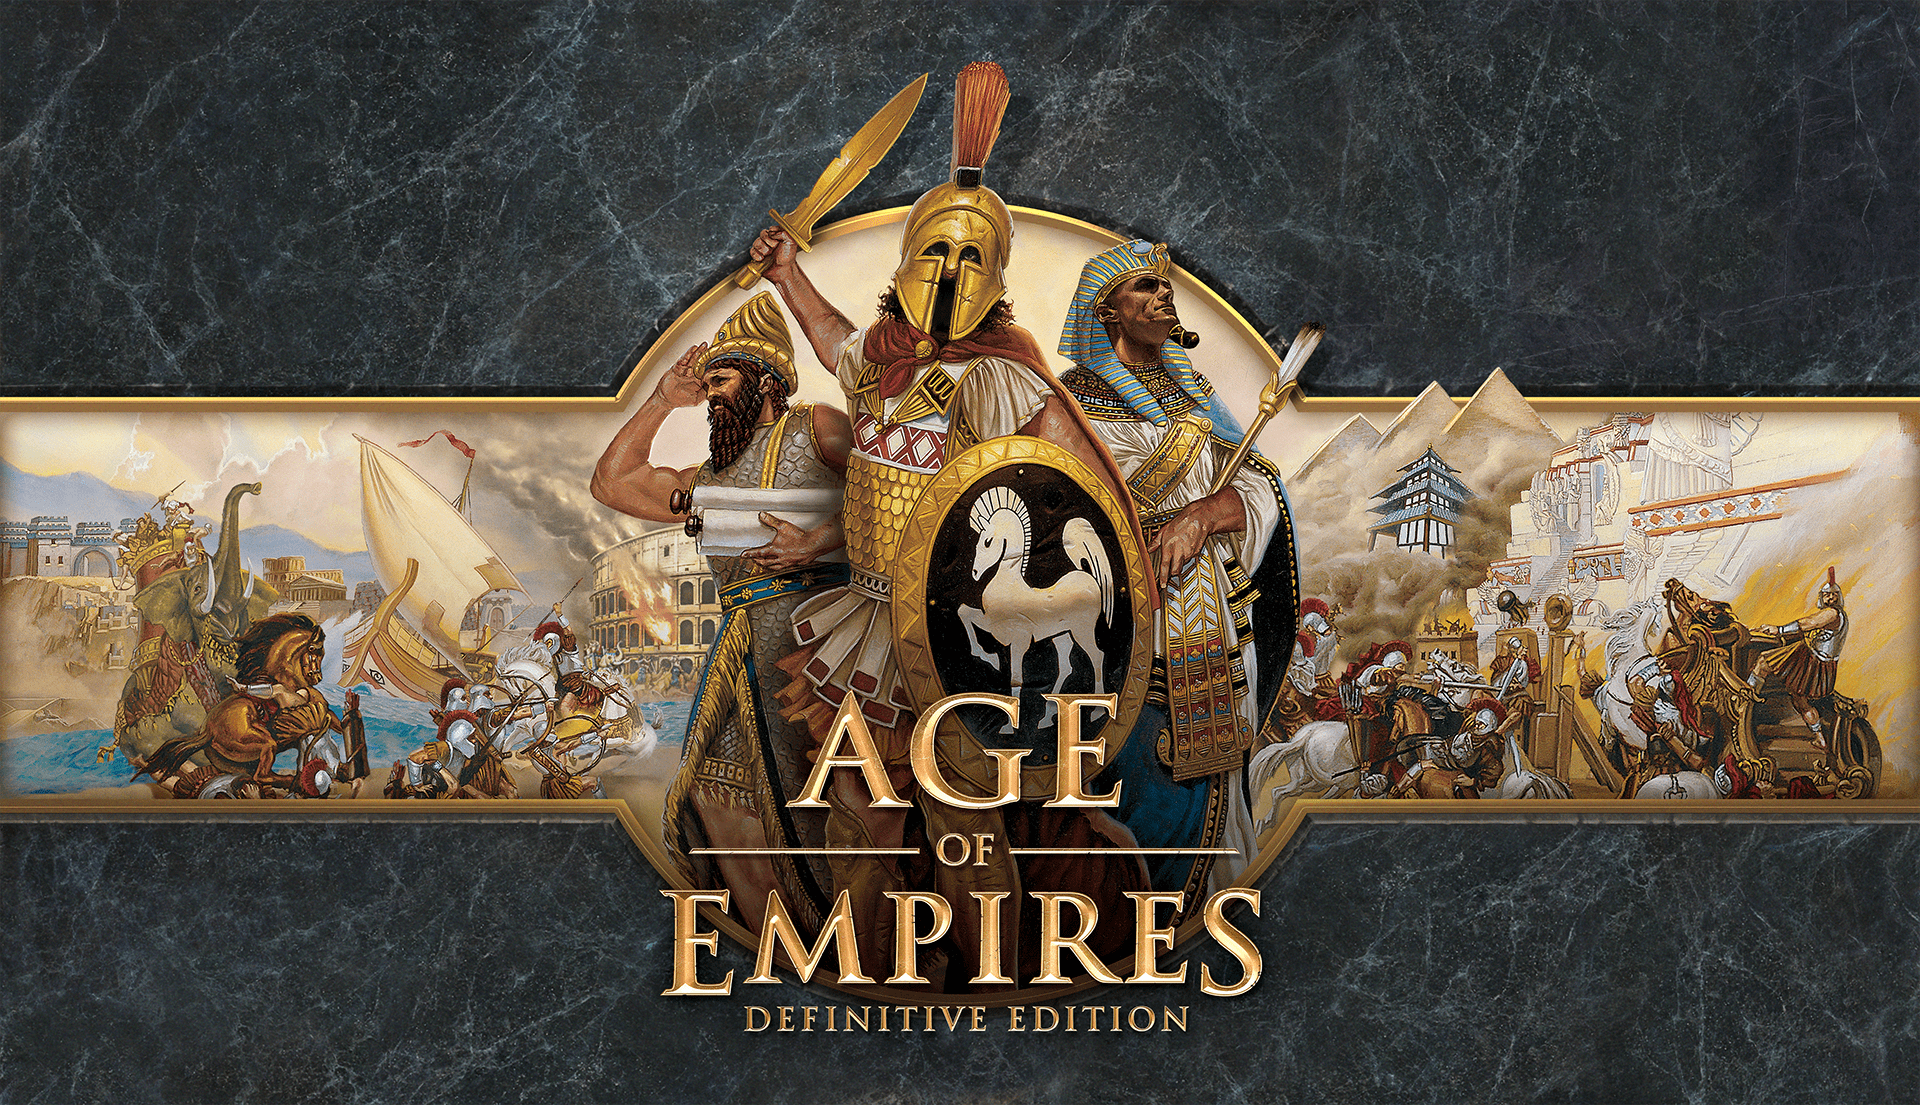 Resultado de imagem para Age of Empires Definitive Edition